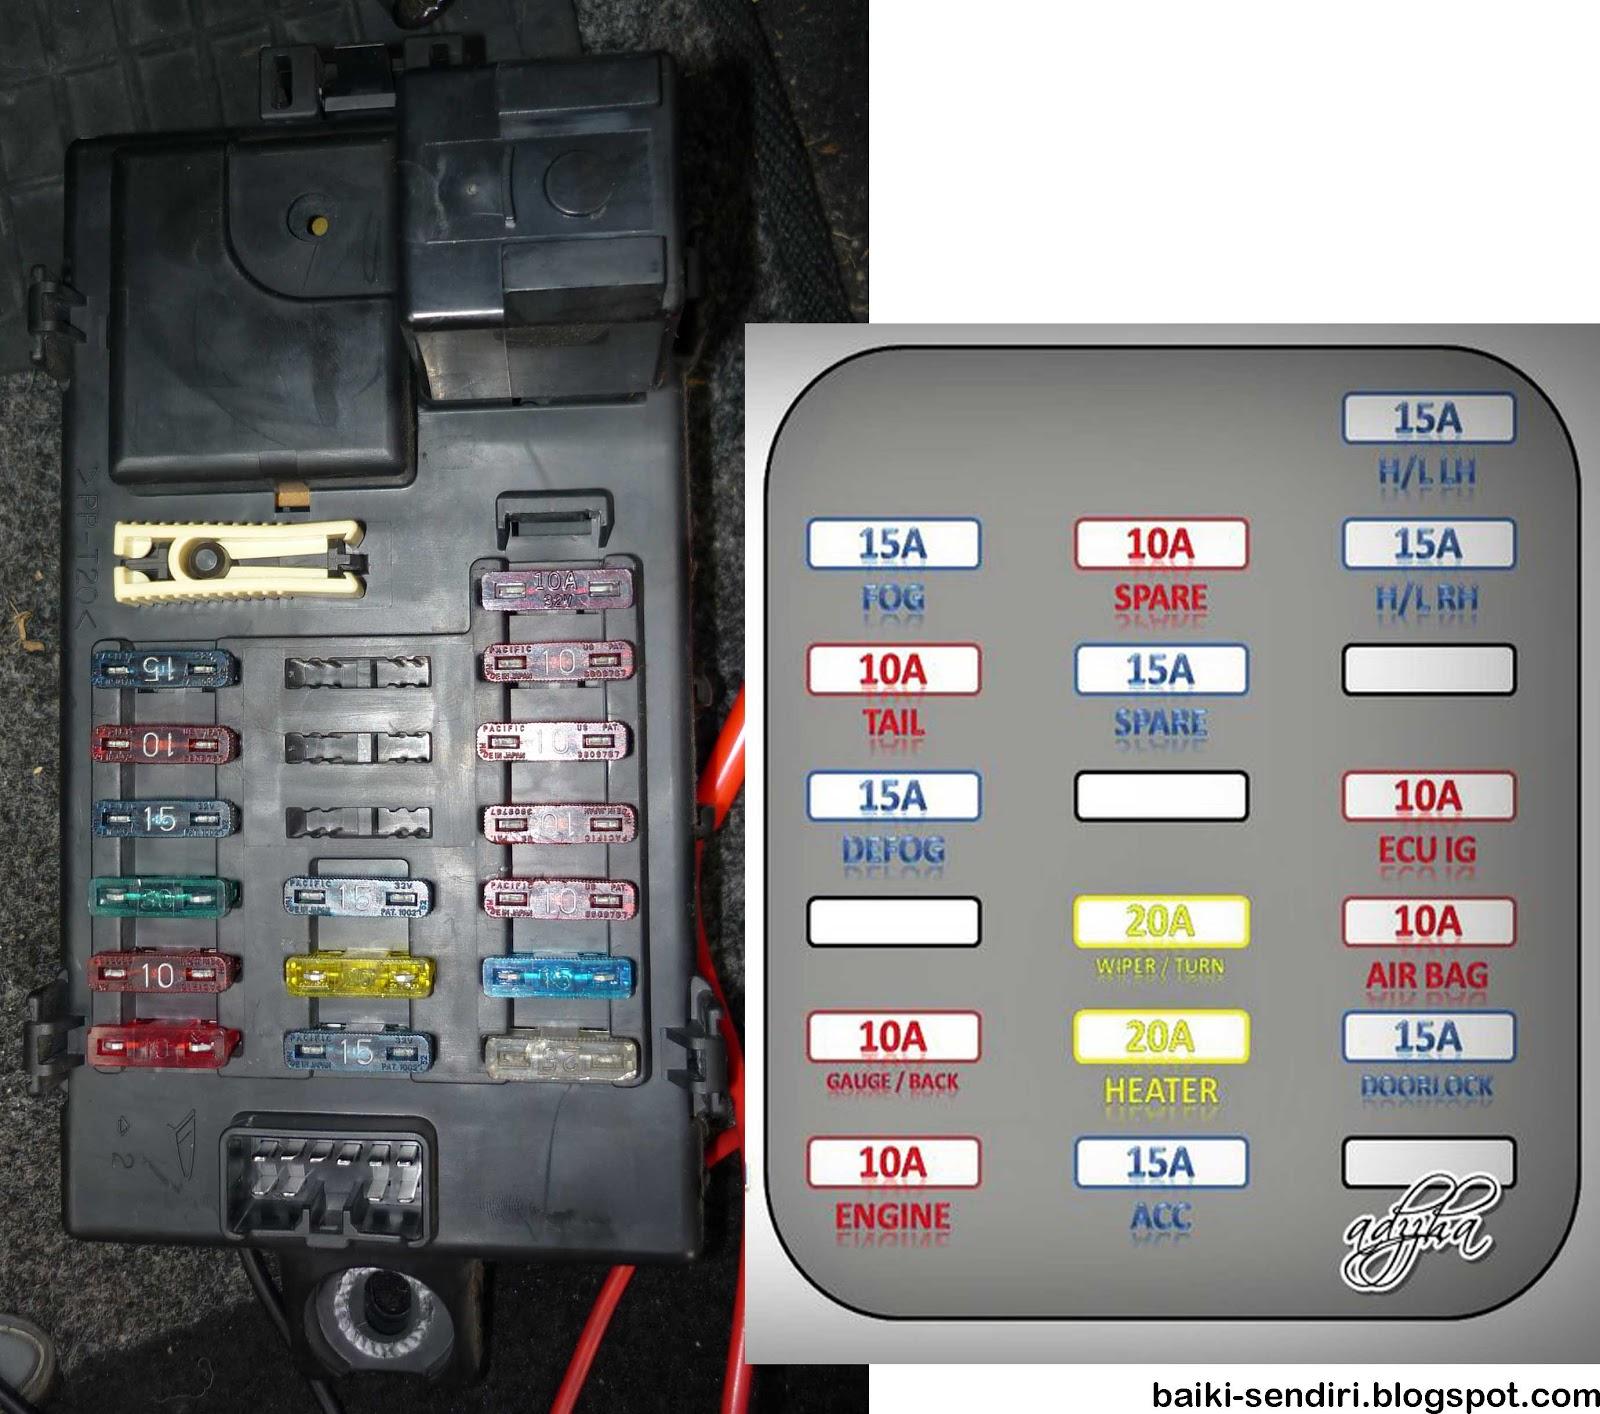 DIY: Fix On Your Own: Daihatsu L7  Perodua Kelisa Autoflip Installation Guide